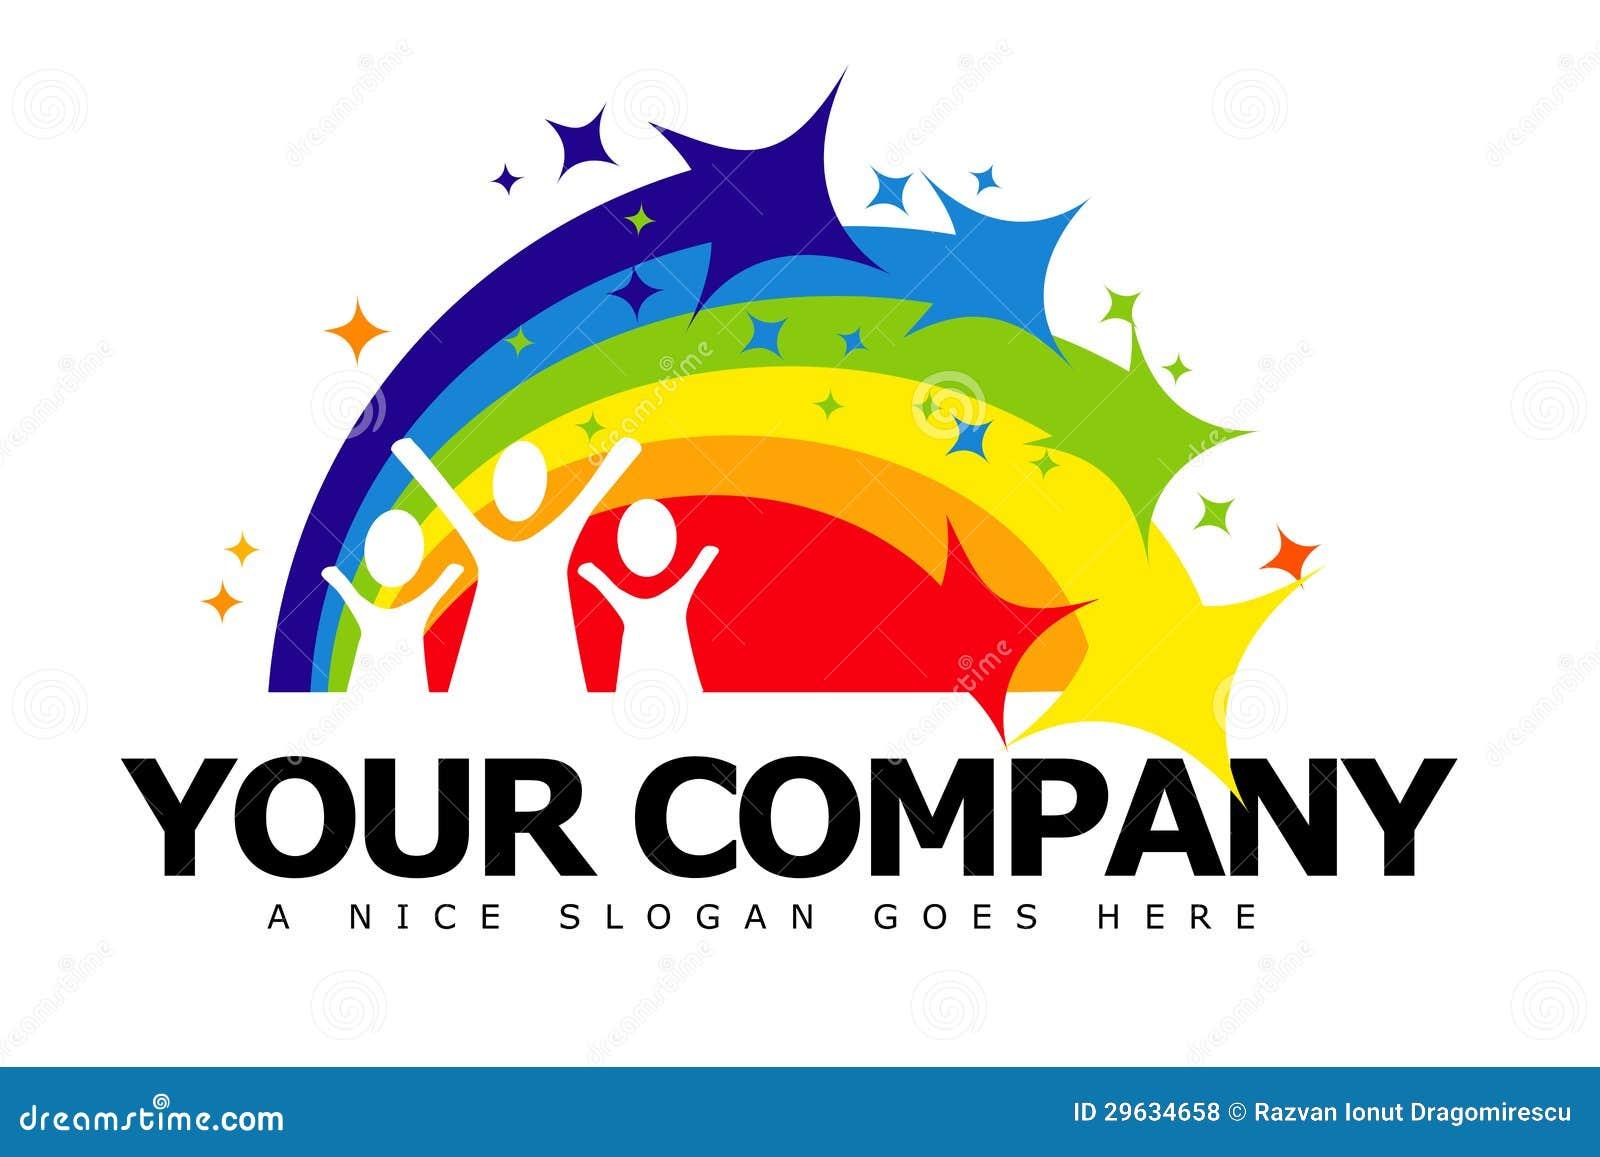 nursery logo royalty free stock photos image 29634658 usa flag clip art free us flag clip art vector